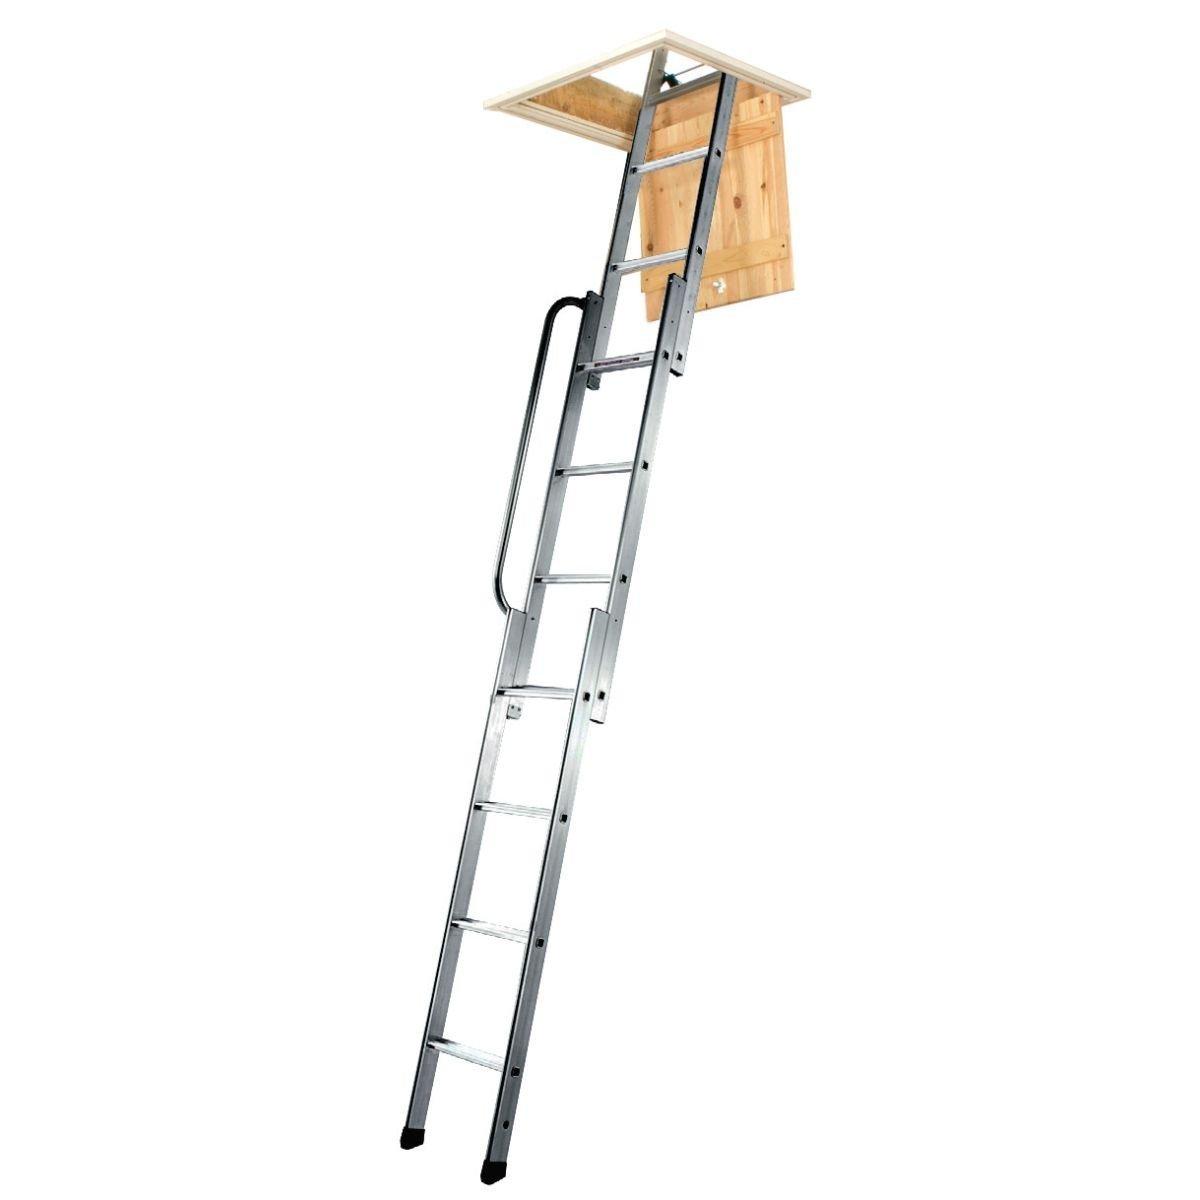 3 Section Loft Ladder Installation in UK